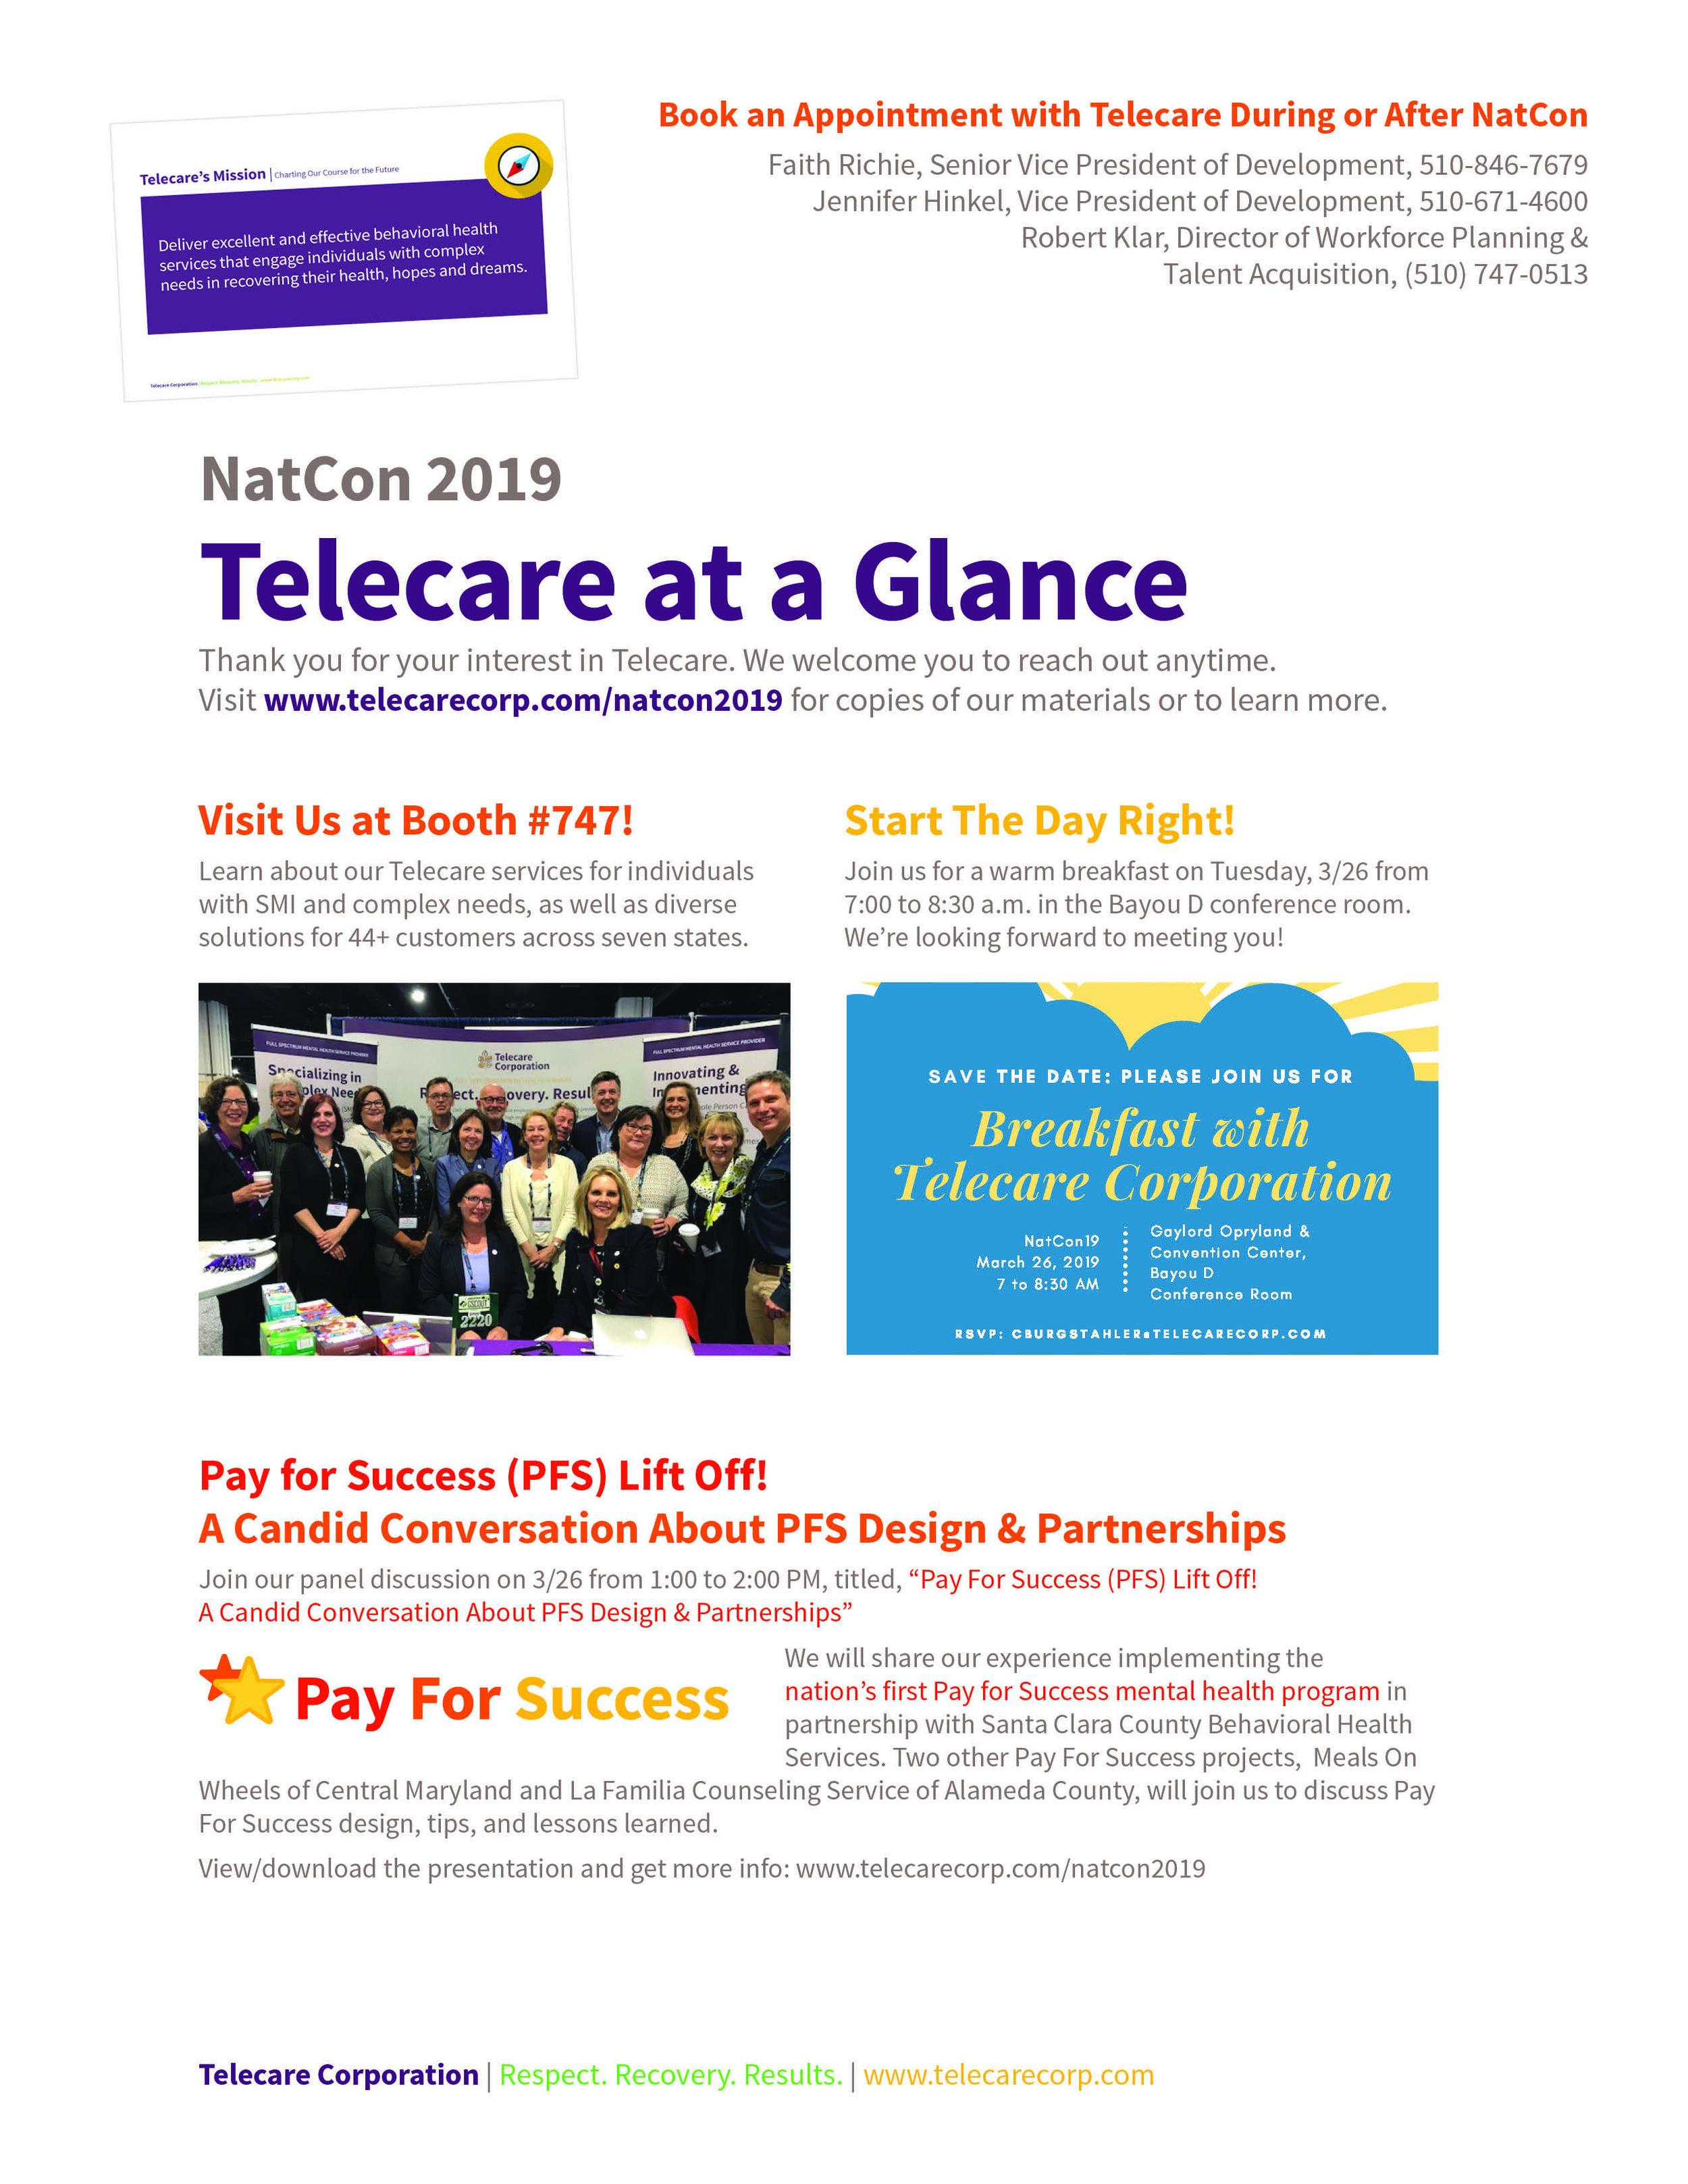 Telecare_NatCon2019_Flyer_vFINAL.jpg